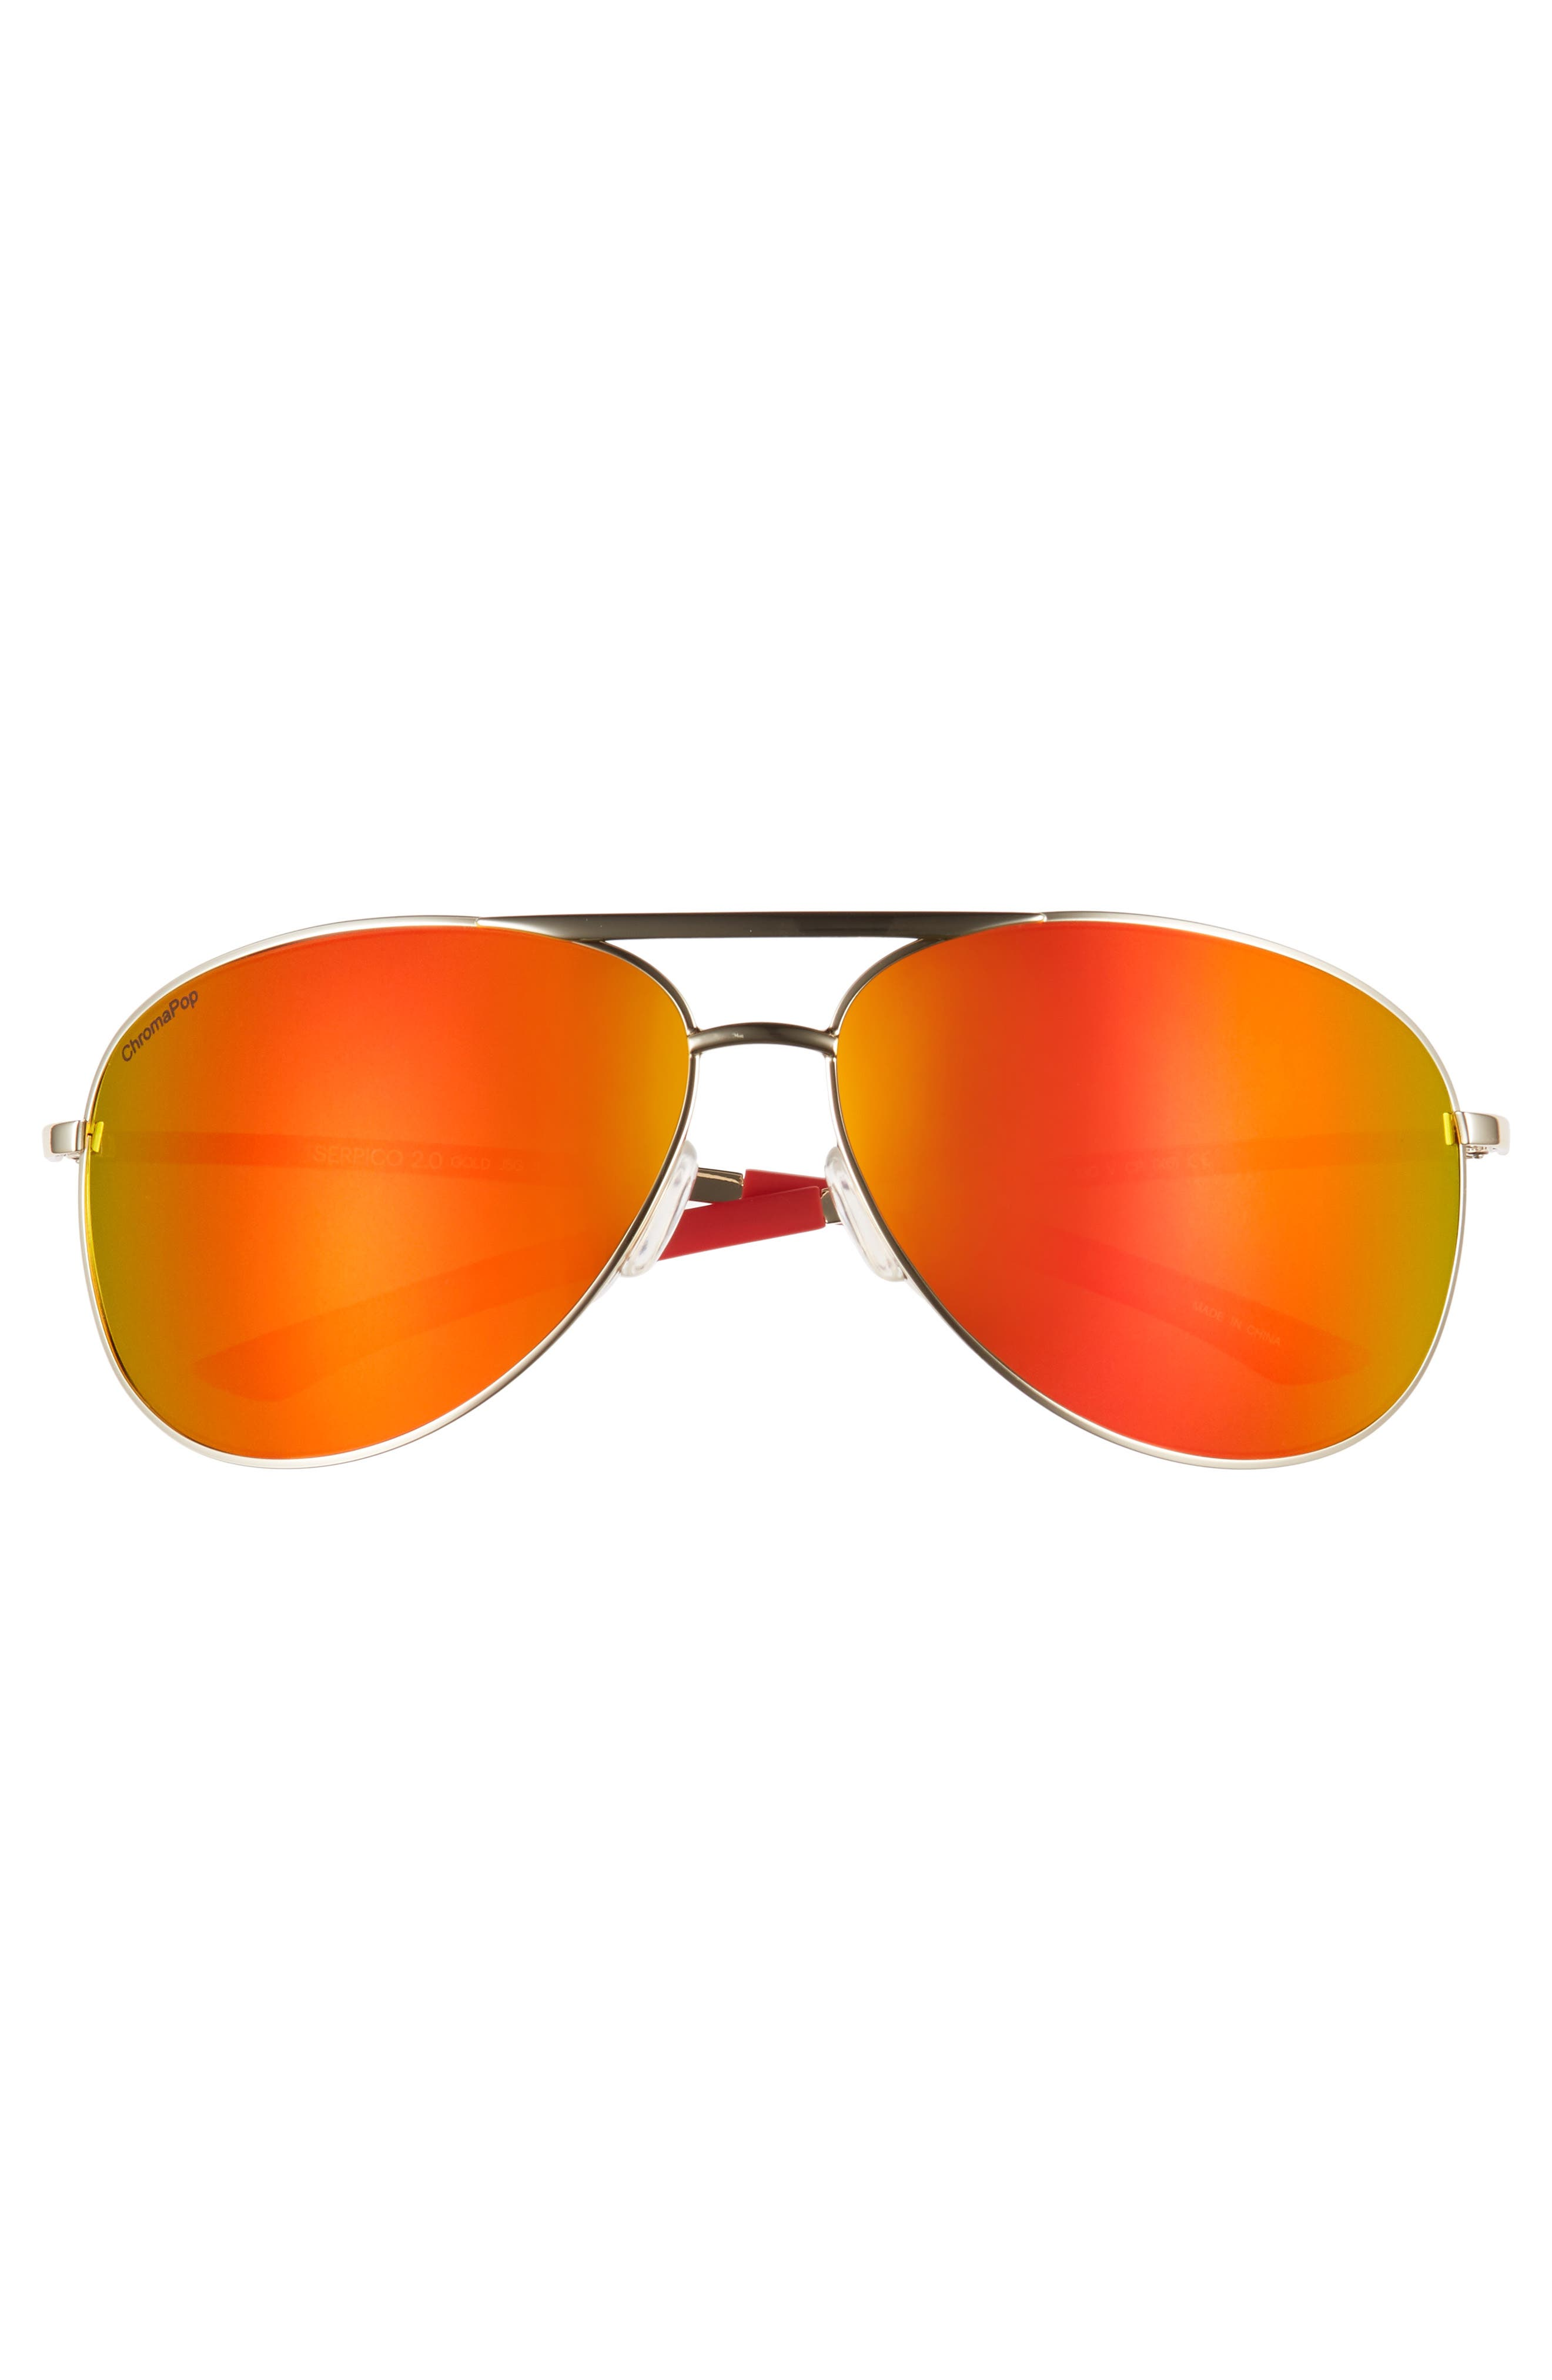 Serpico 2 65mm Mirrored ChromaPop<sup>™</sup> Aviator Sunglasses,                             Alternate thumbnail 2, color,                             GOLD/ RED